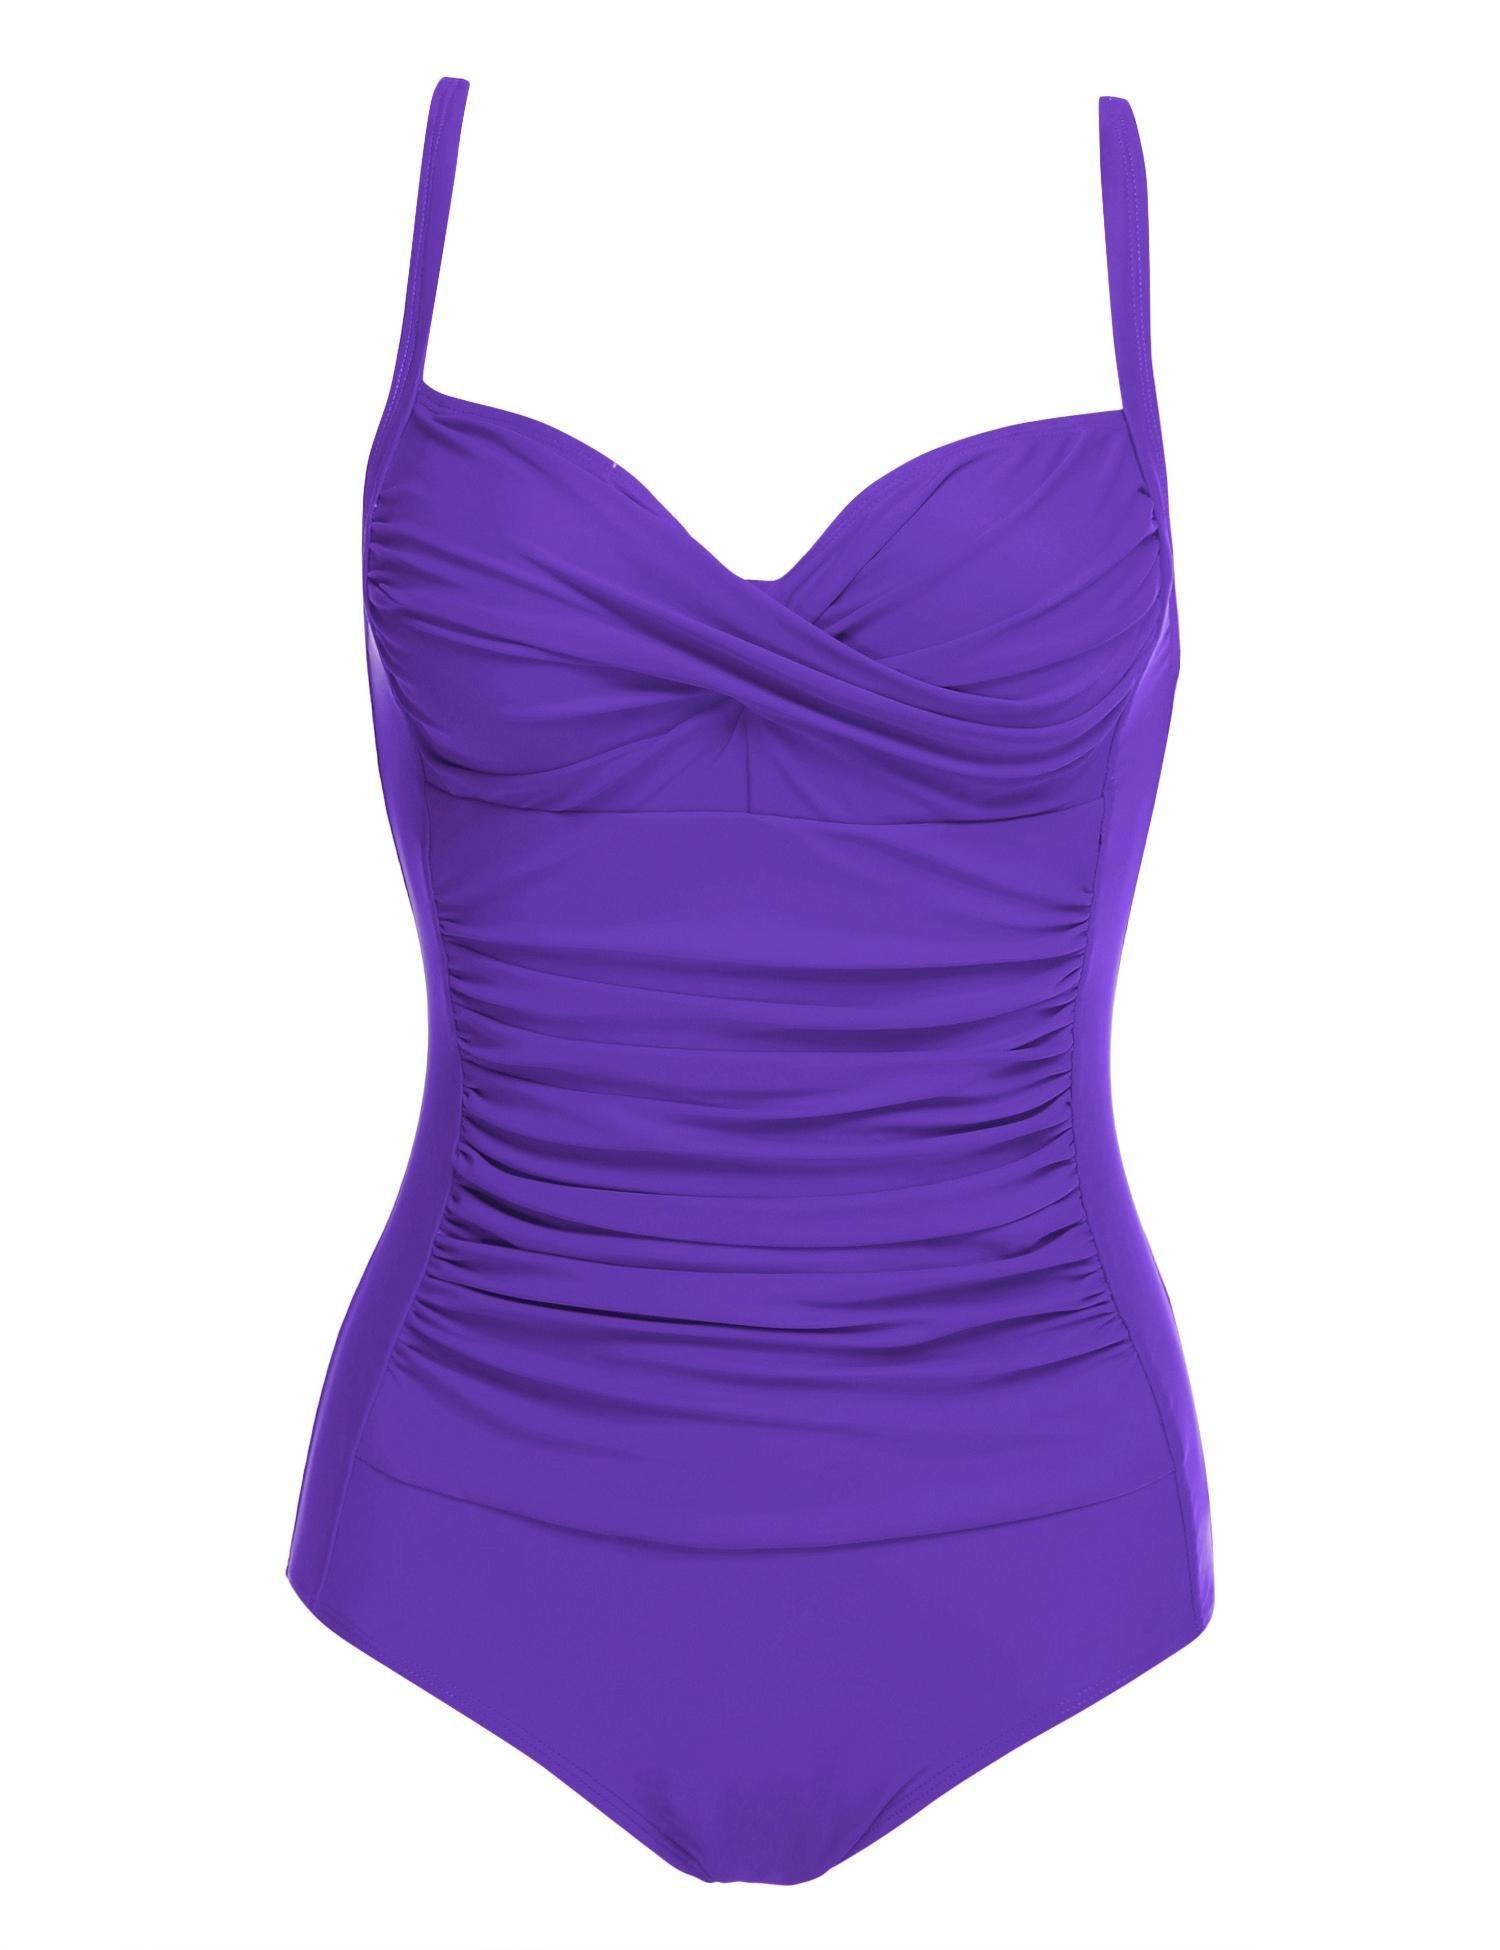 Women Swimsuit One Piece Tummy Control Slimming Sexy Swimwear Bathing Suit